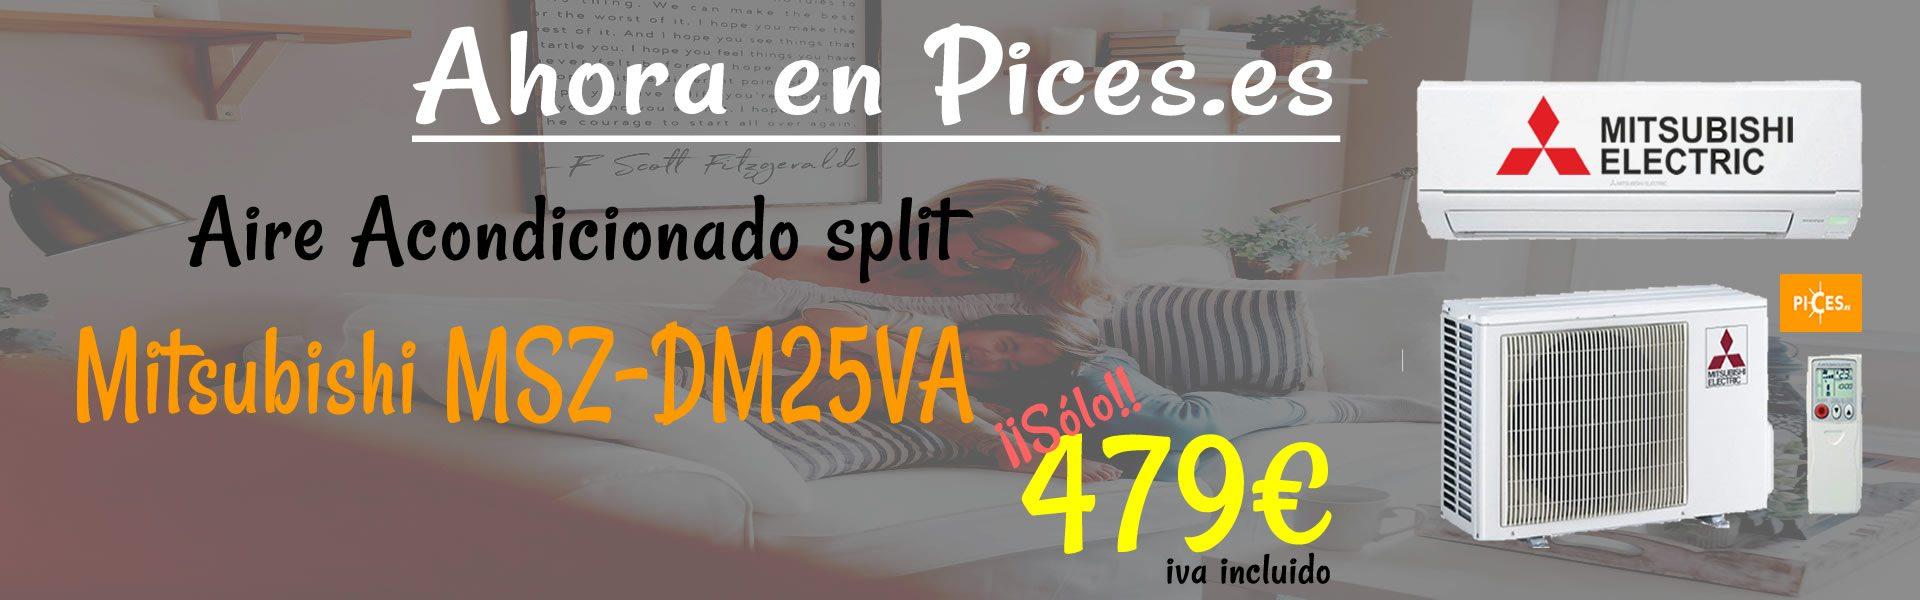 oferta-de-aire-acondicionado-split-mitsubishi-msz-dm25va-por-479€